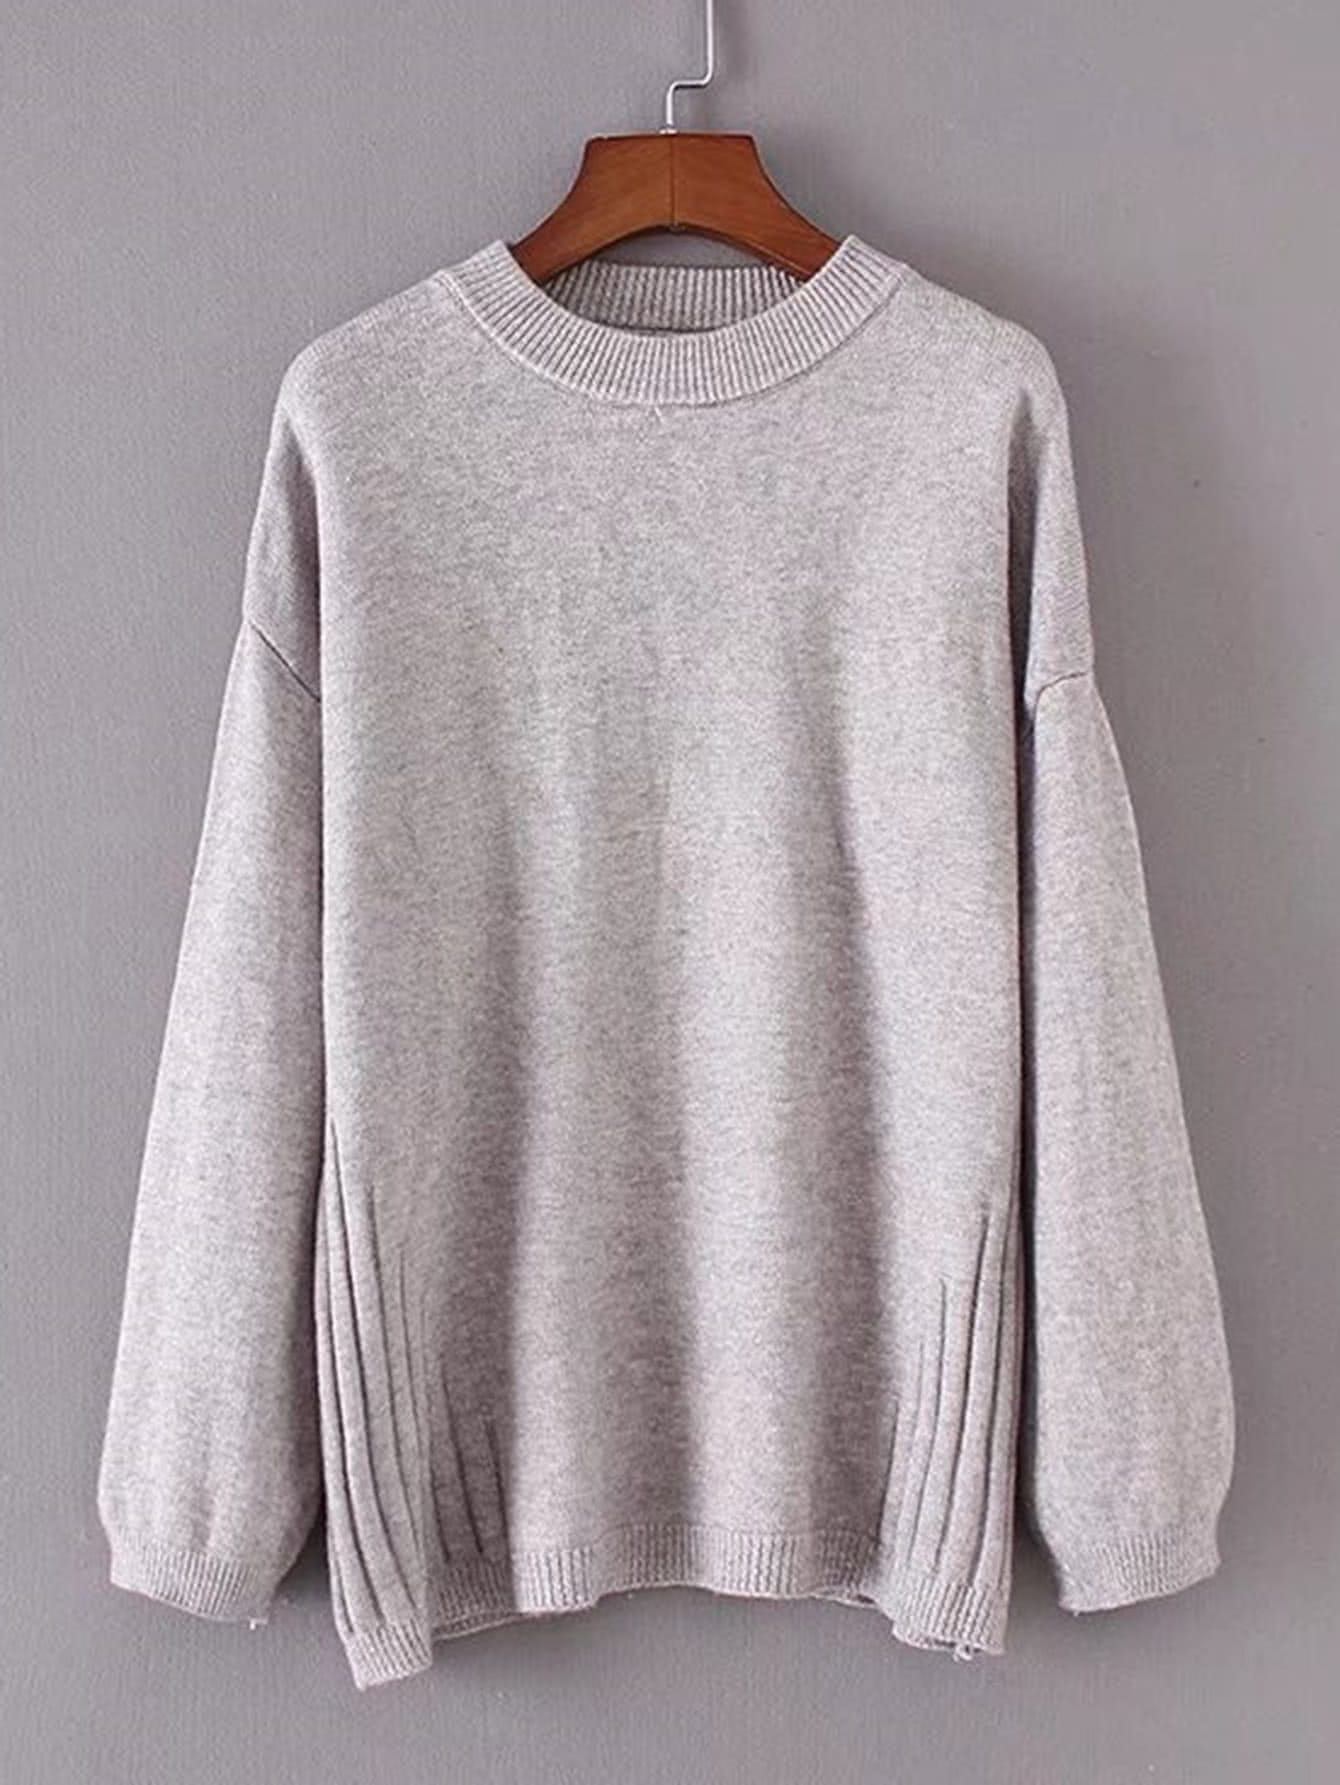 Rib Detail Drop Shoulder Sweater sweater171108203